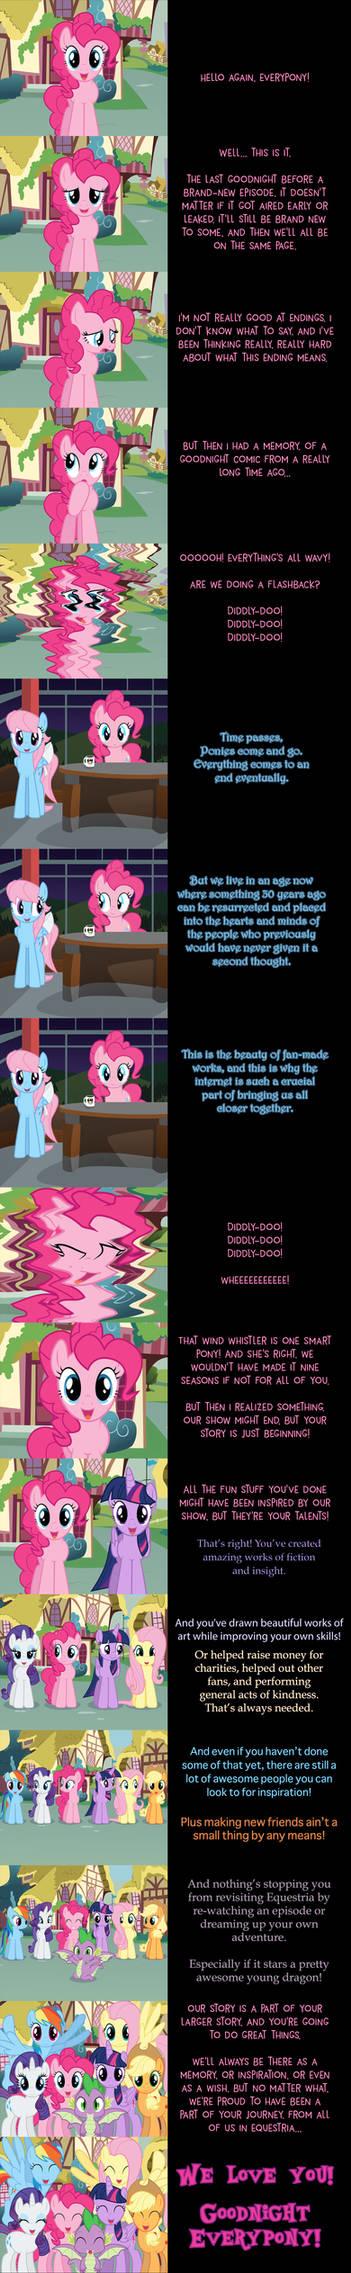 Pinkie Pie Says Goodnight: Your Story